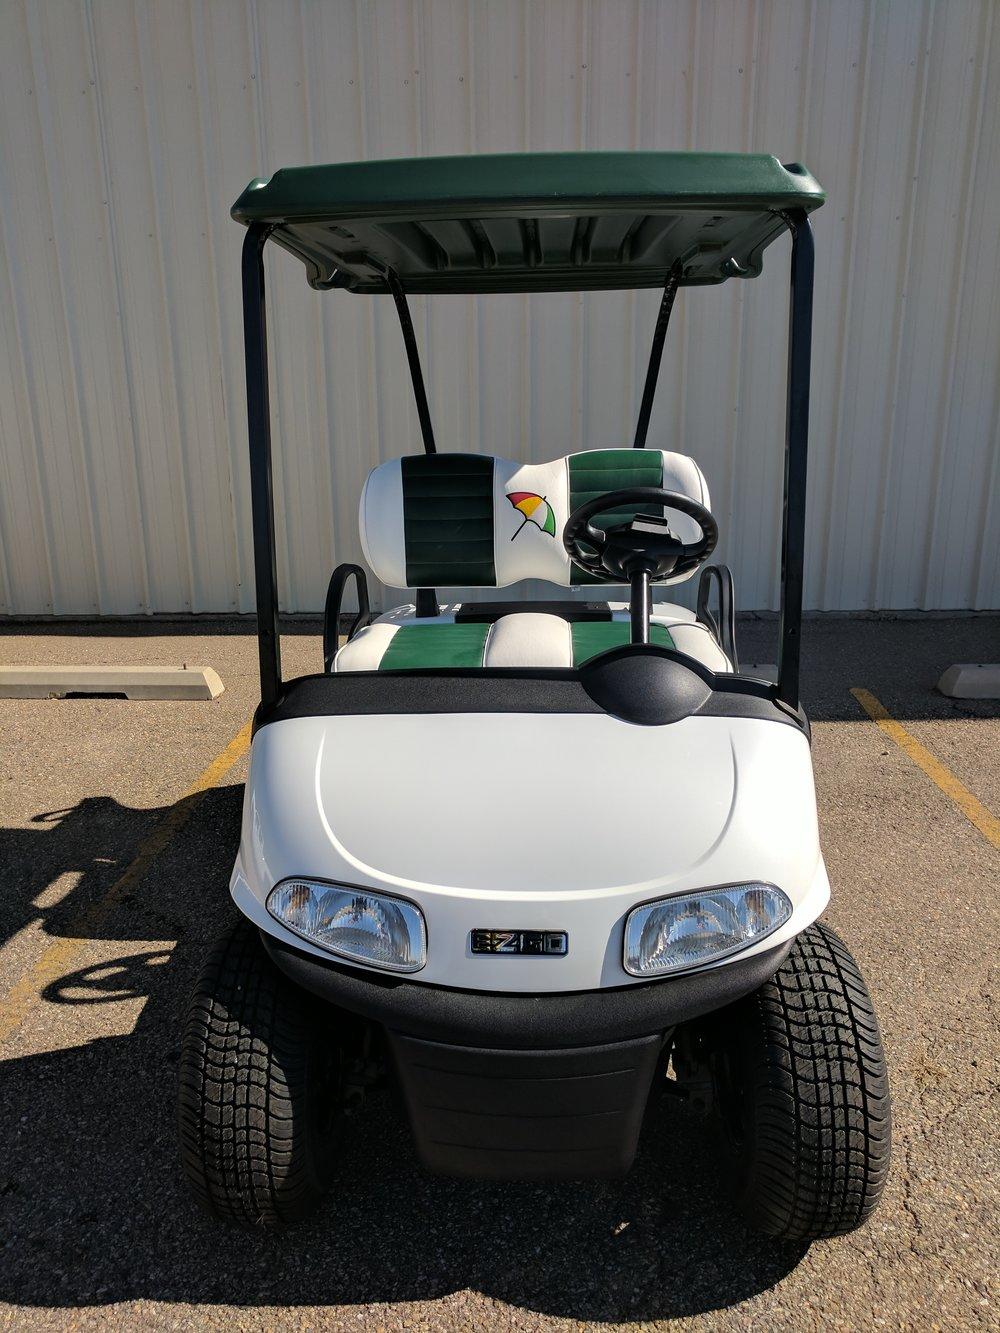 On The Lot — West Texas Golf Cars Gt Golf Cart on gt 500 wheel, gt 500 kia, gt 500 parts, gt 500 grill, gt 500 truck, gt 500 suzuki, gt 500 car, gt 500 scooter,